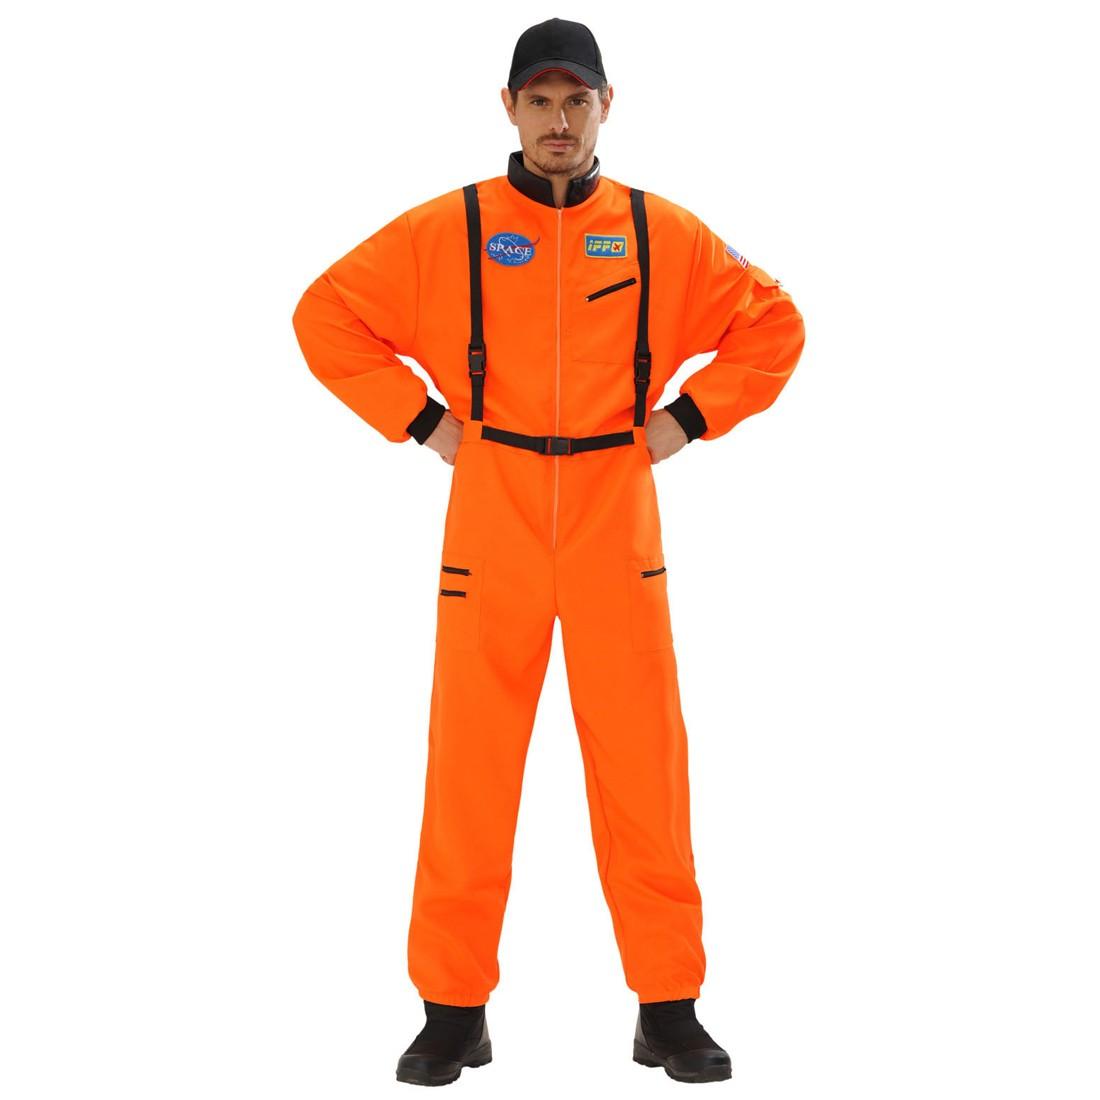 astronautenanzug astronauten kost m orange space. Black Bedroom Furniture Sets. Home Design Ideas